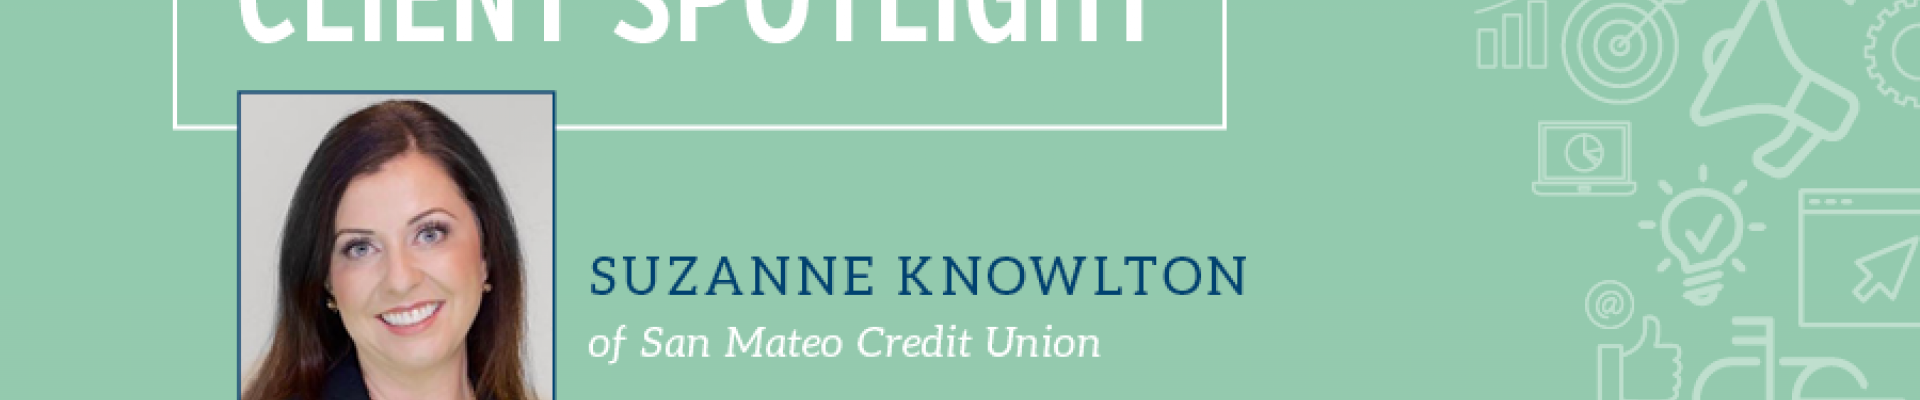 Client Spotlight: Suzanne Knowlton of San Mateo Credit Union